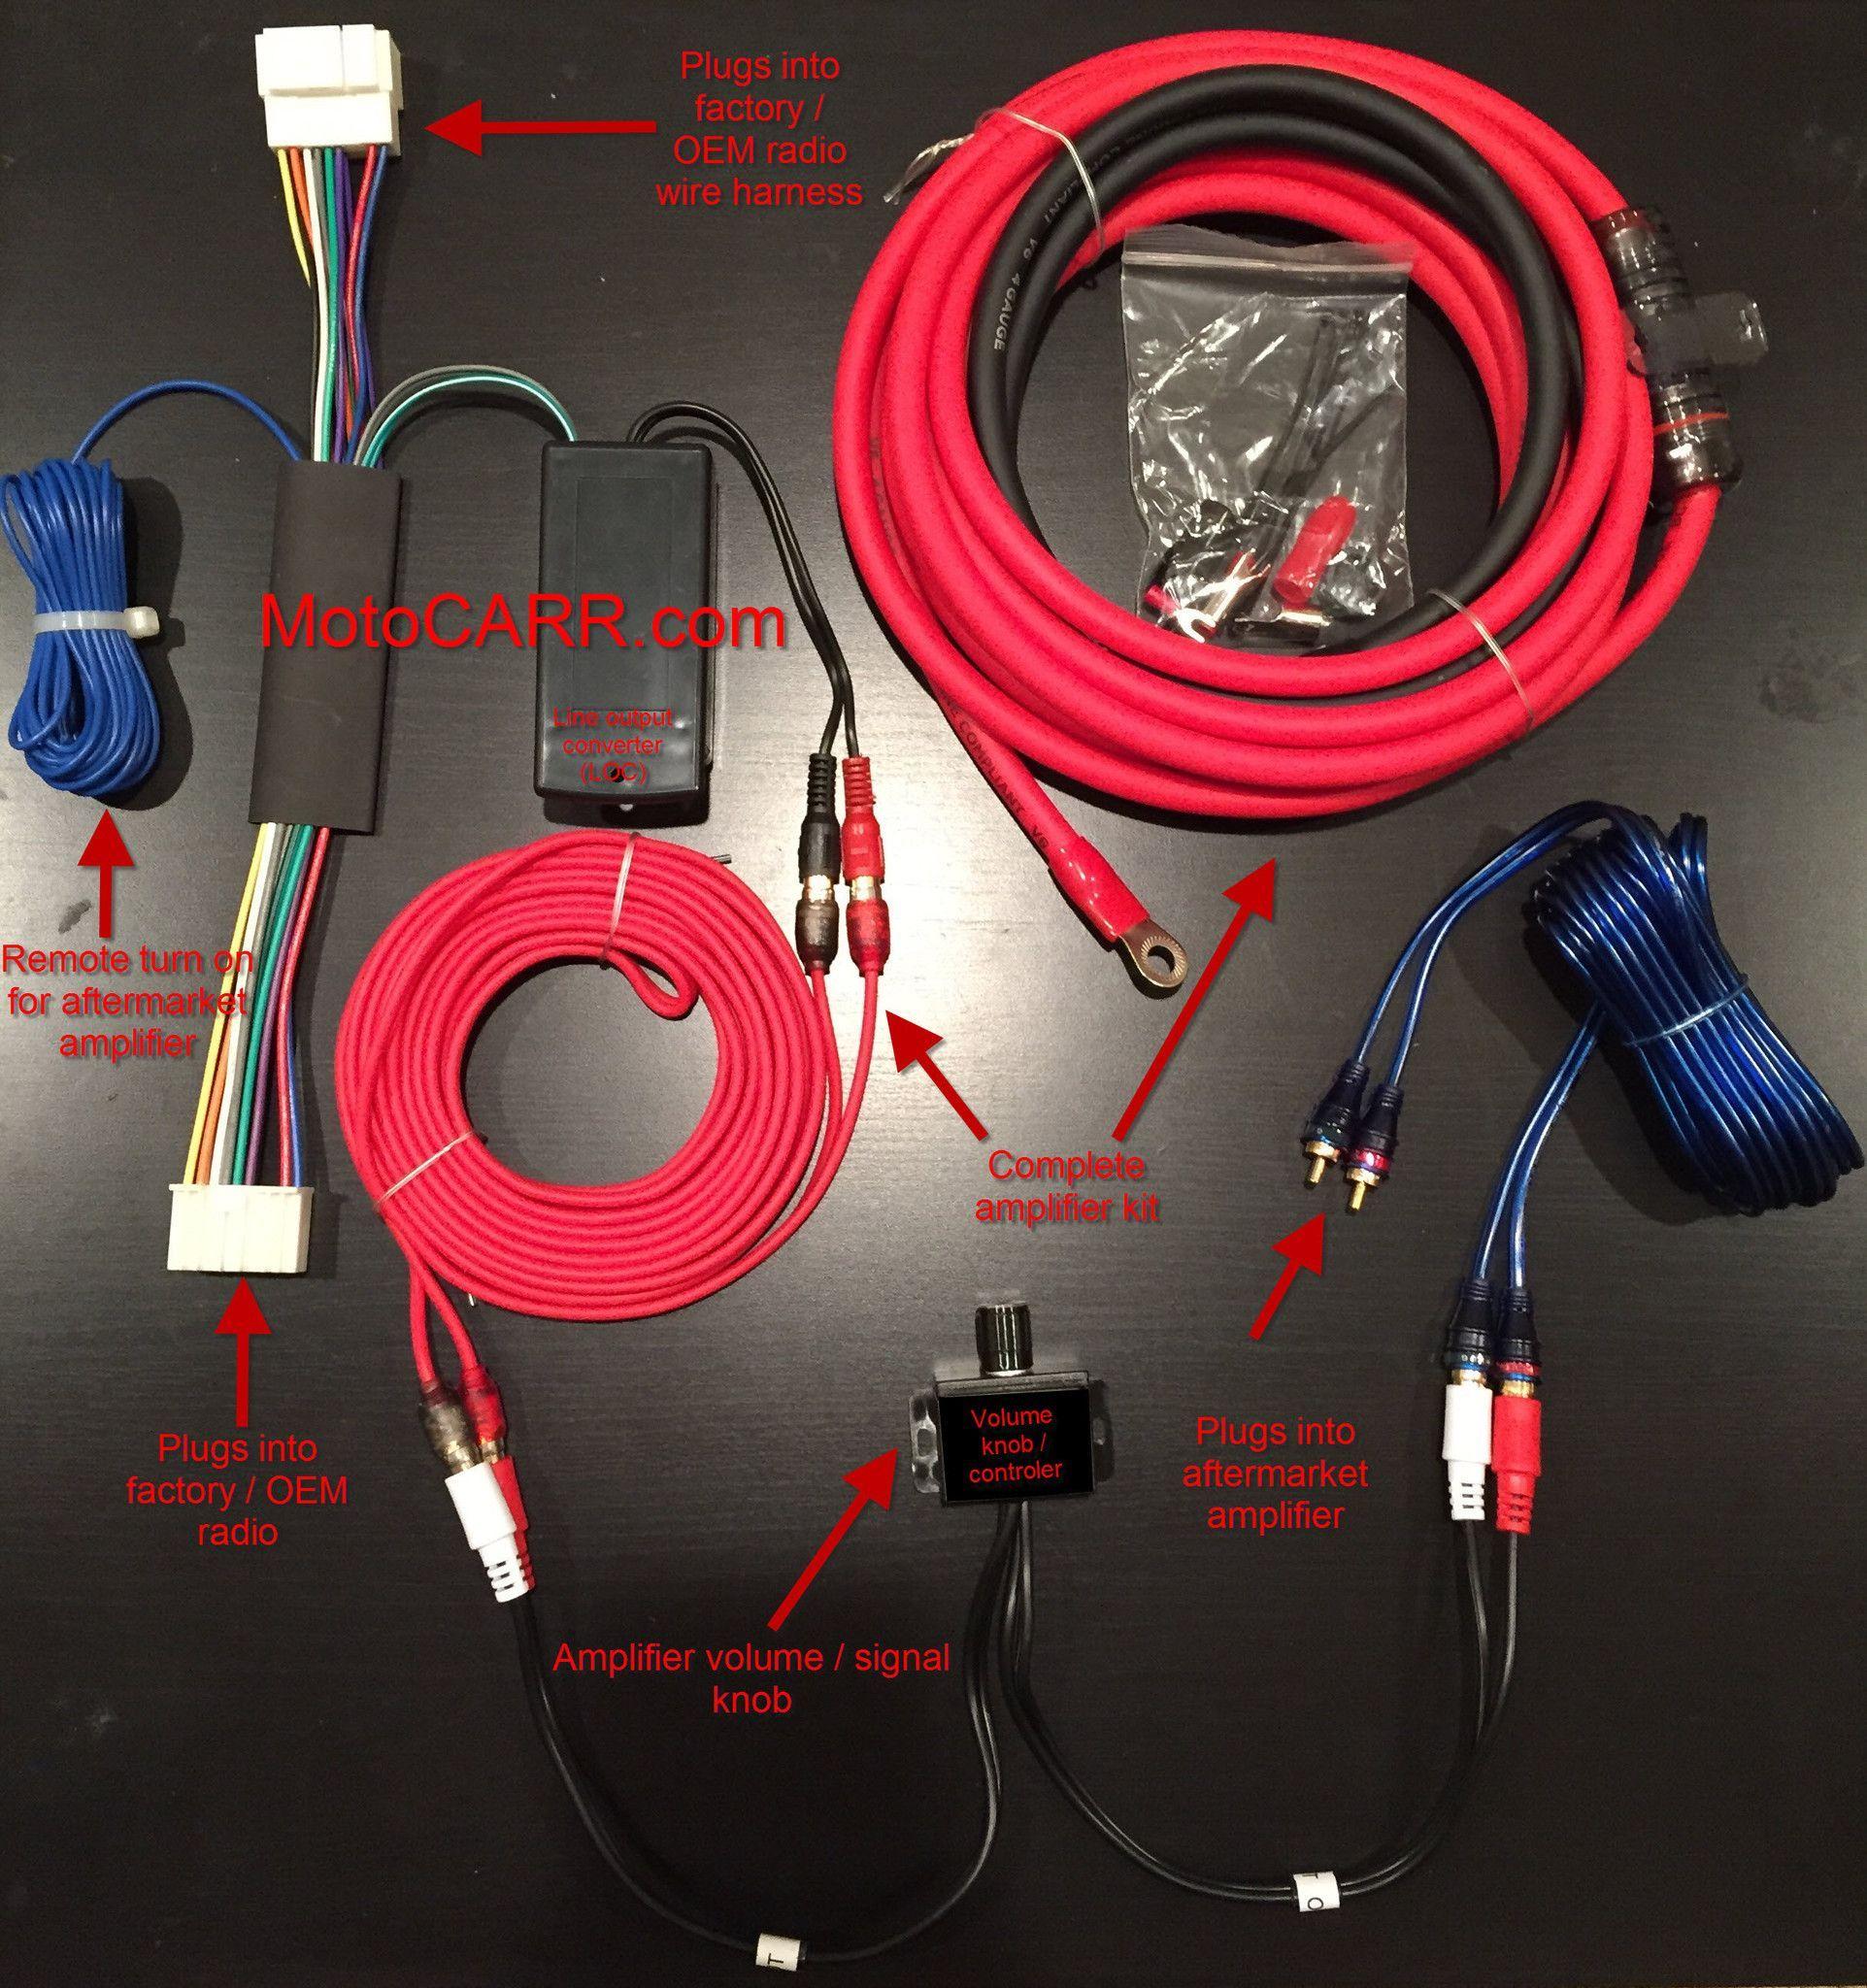 Honda Acura Factory Radio Add An Amplifier Interface Harness 1000 Wiring For Watt Kit Volume Knob